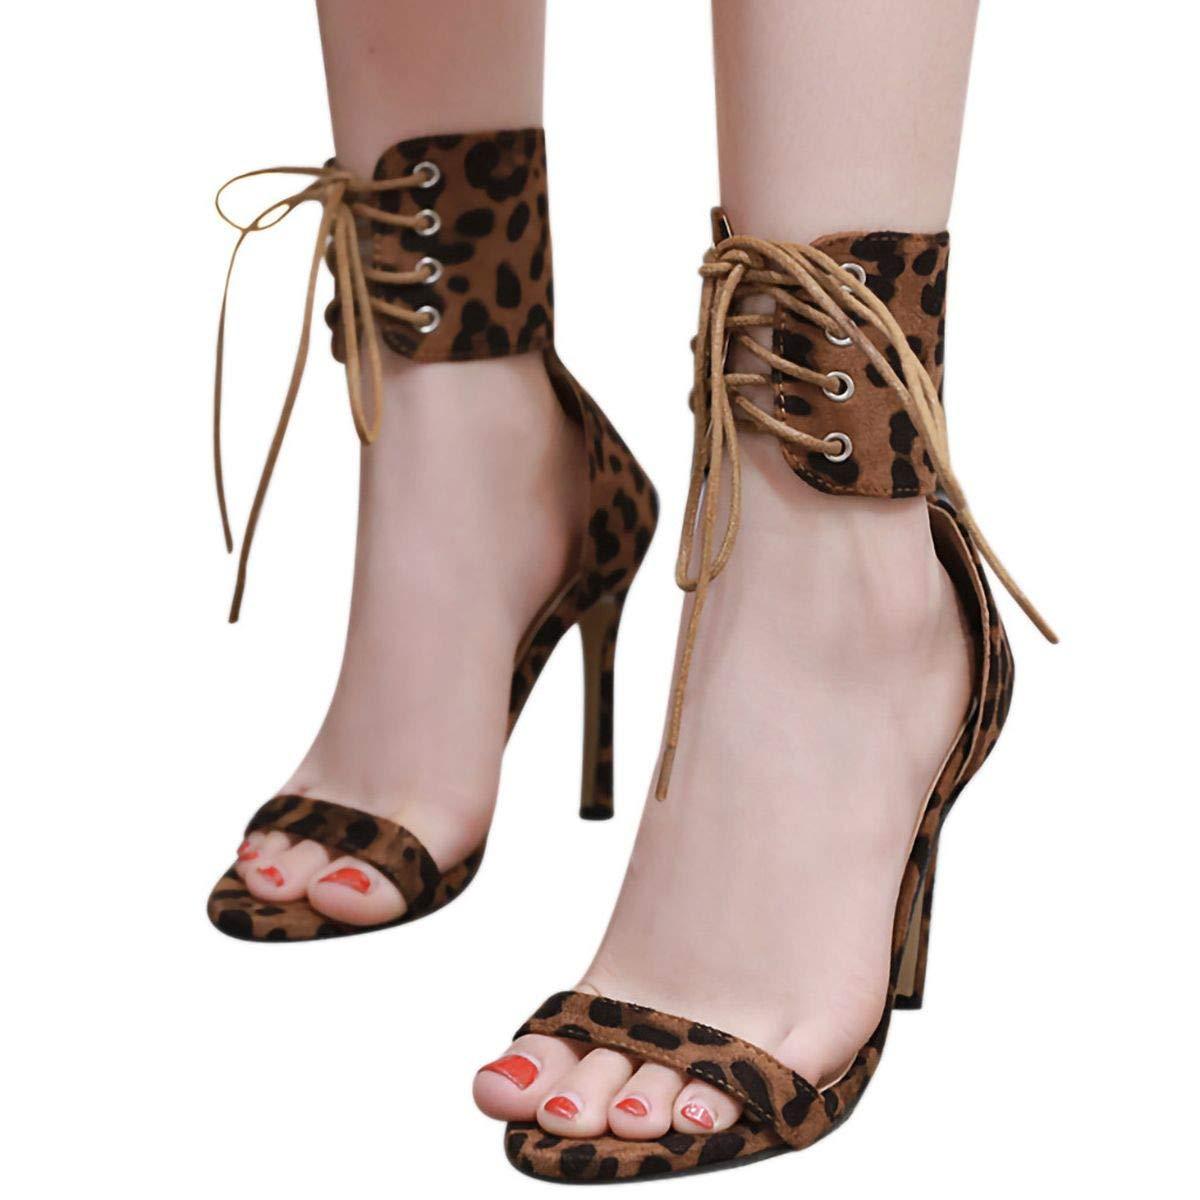 Meiliwanju Stiletto High Heel, Womens Open Toe Leopard Print Comfortable Ankle Wide Strap Lace-Up Sandal Dress Pump (Yellow, 5)